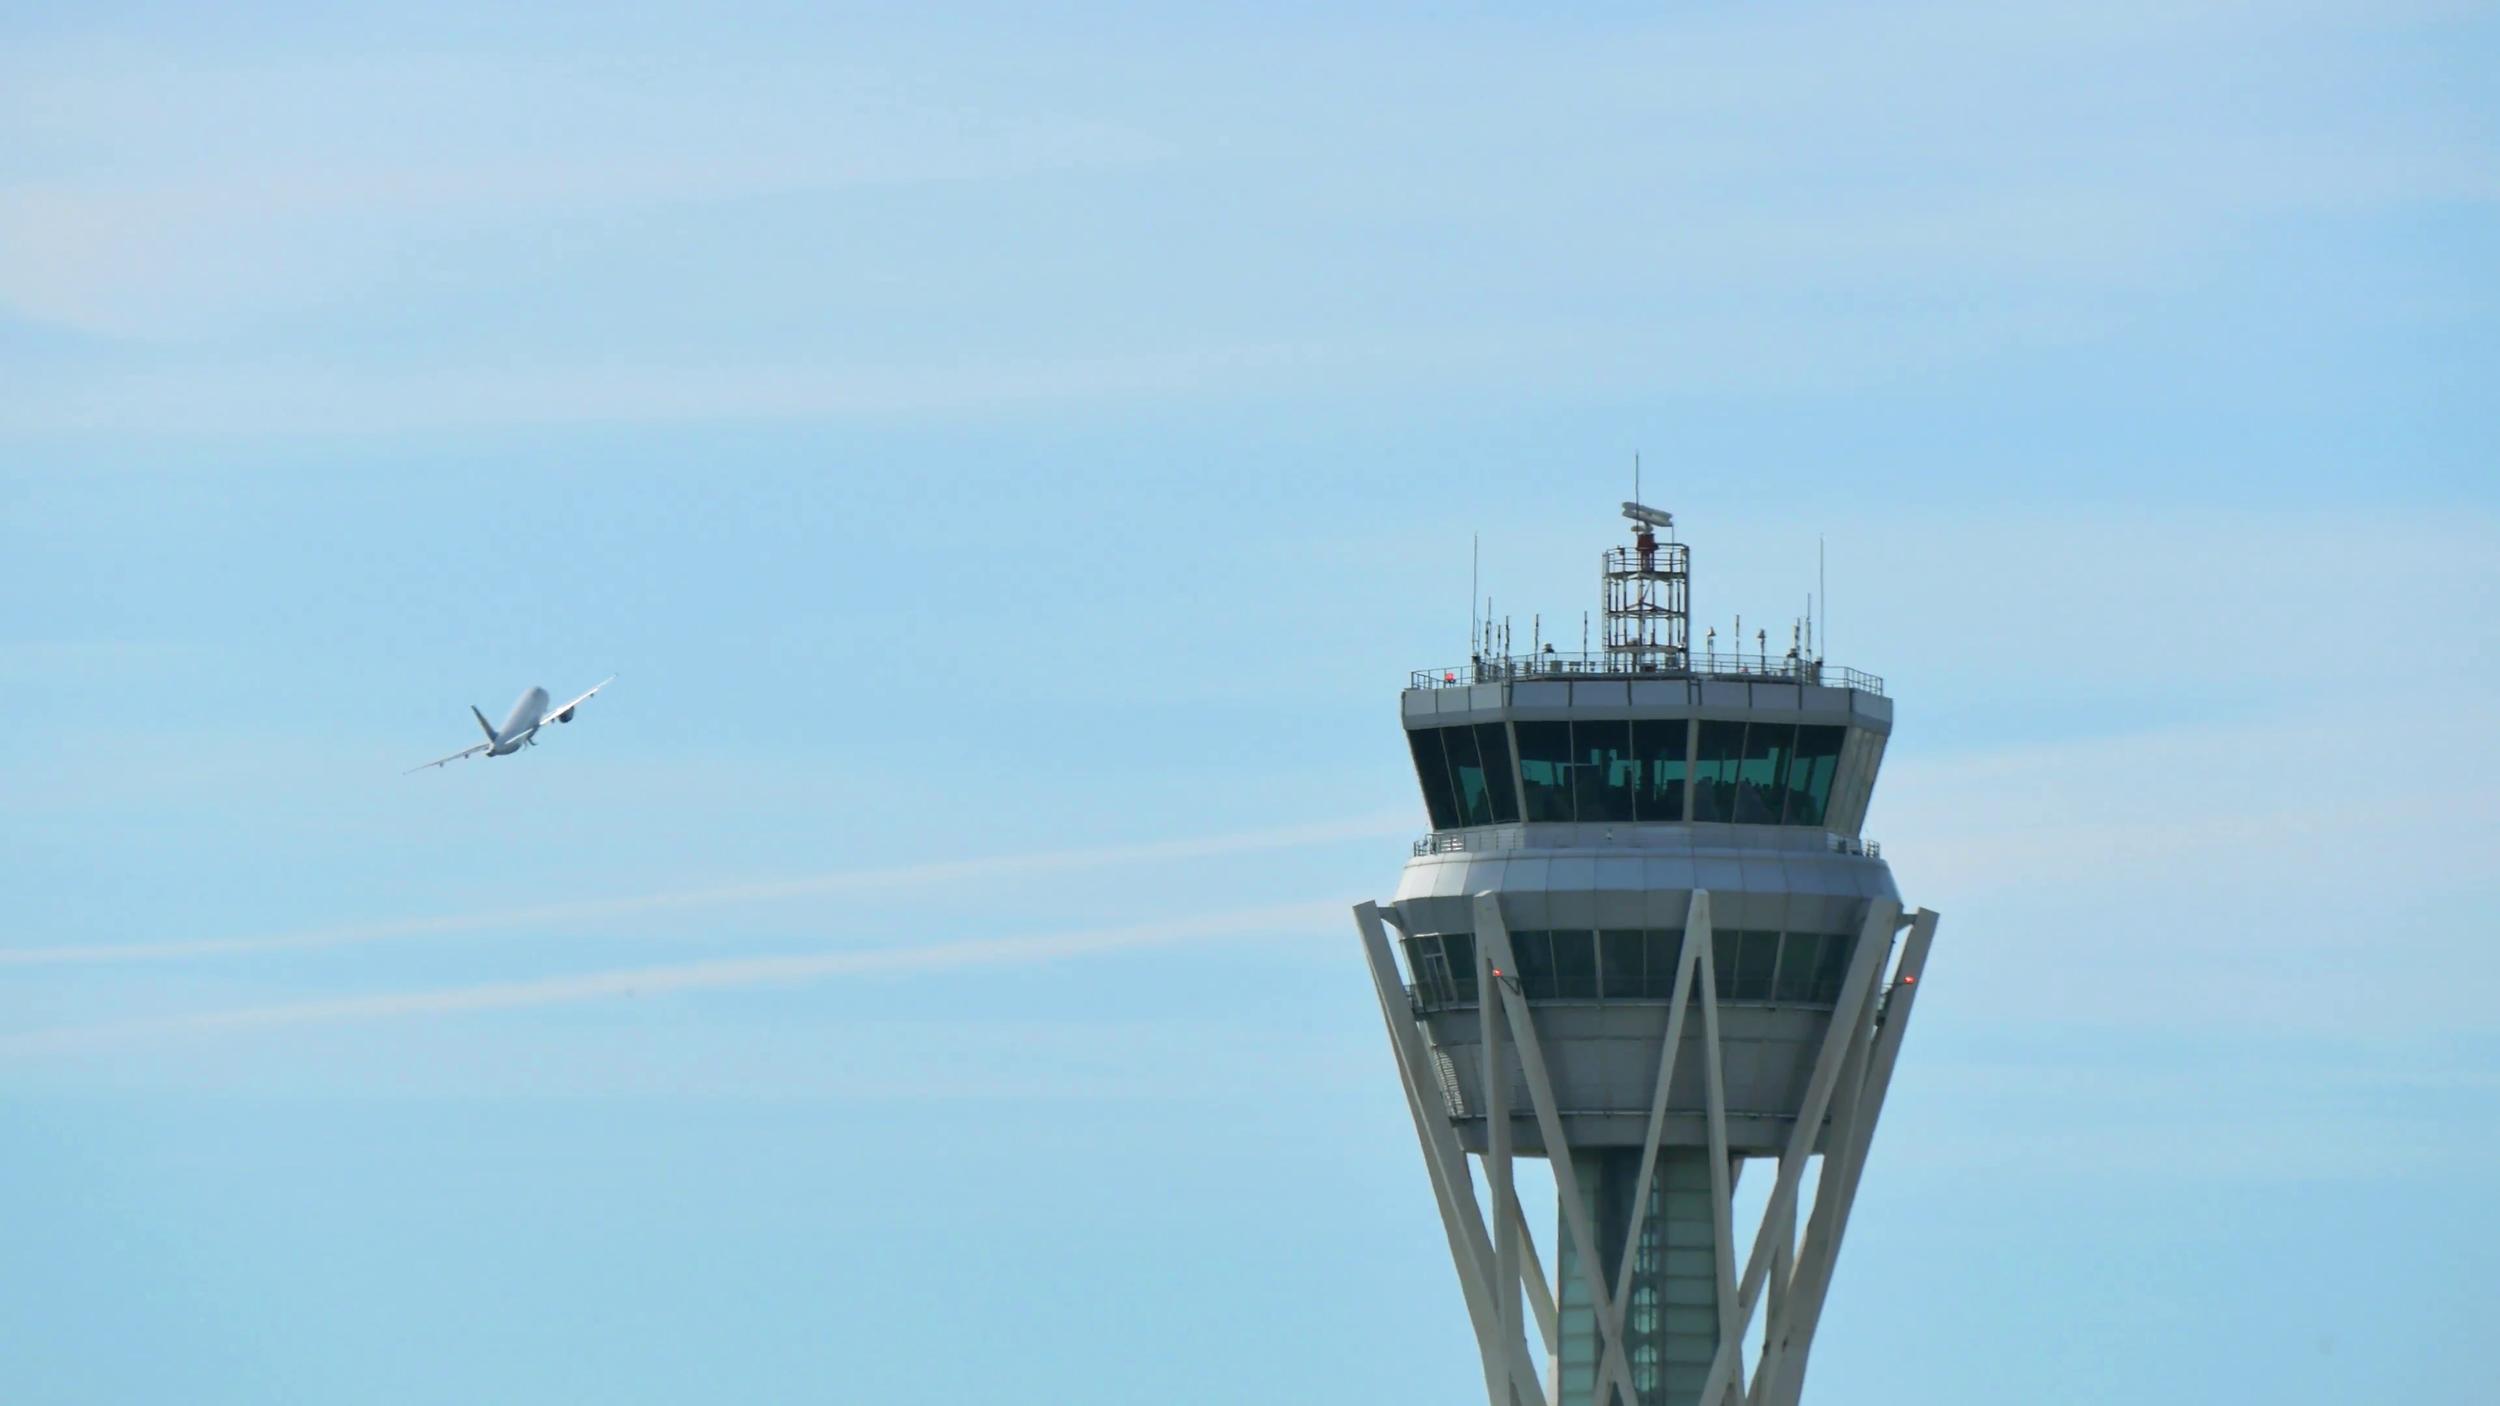 barcelona-airport-radar-control-tower-air-traffic-control-tower-at-barcelona-airport-with-flying-plane-in-sky-airport-control-tower-at-full-capacity-radar-control-tower-with-an-airplane-across-the-sky_njb1qhgge__F00.png